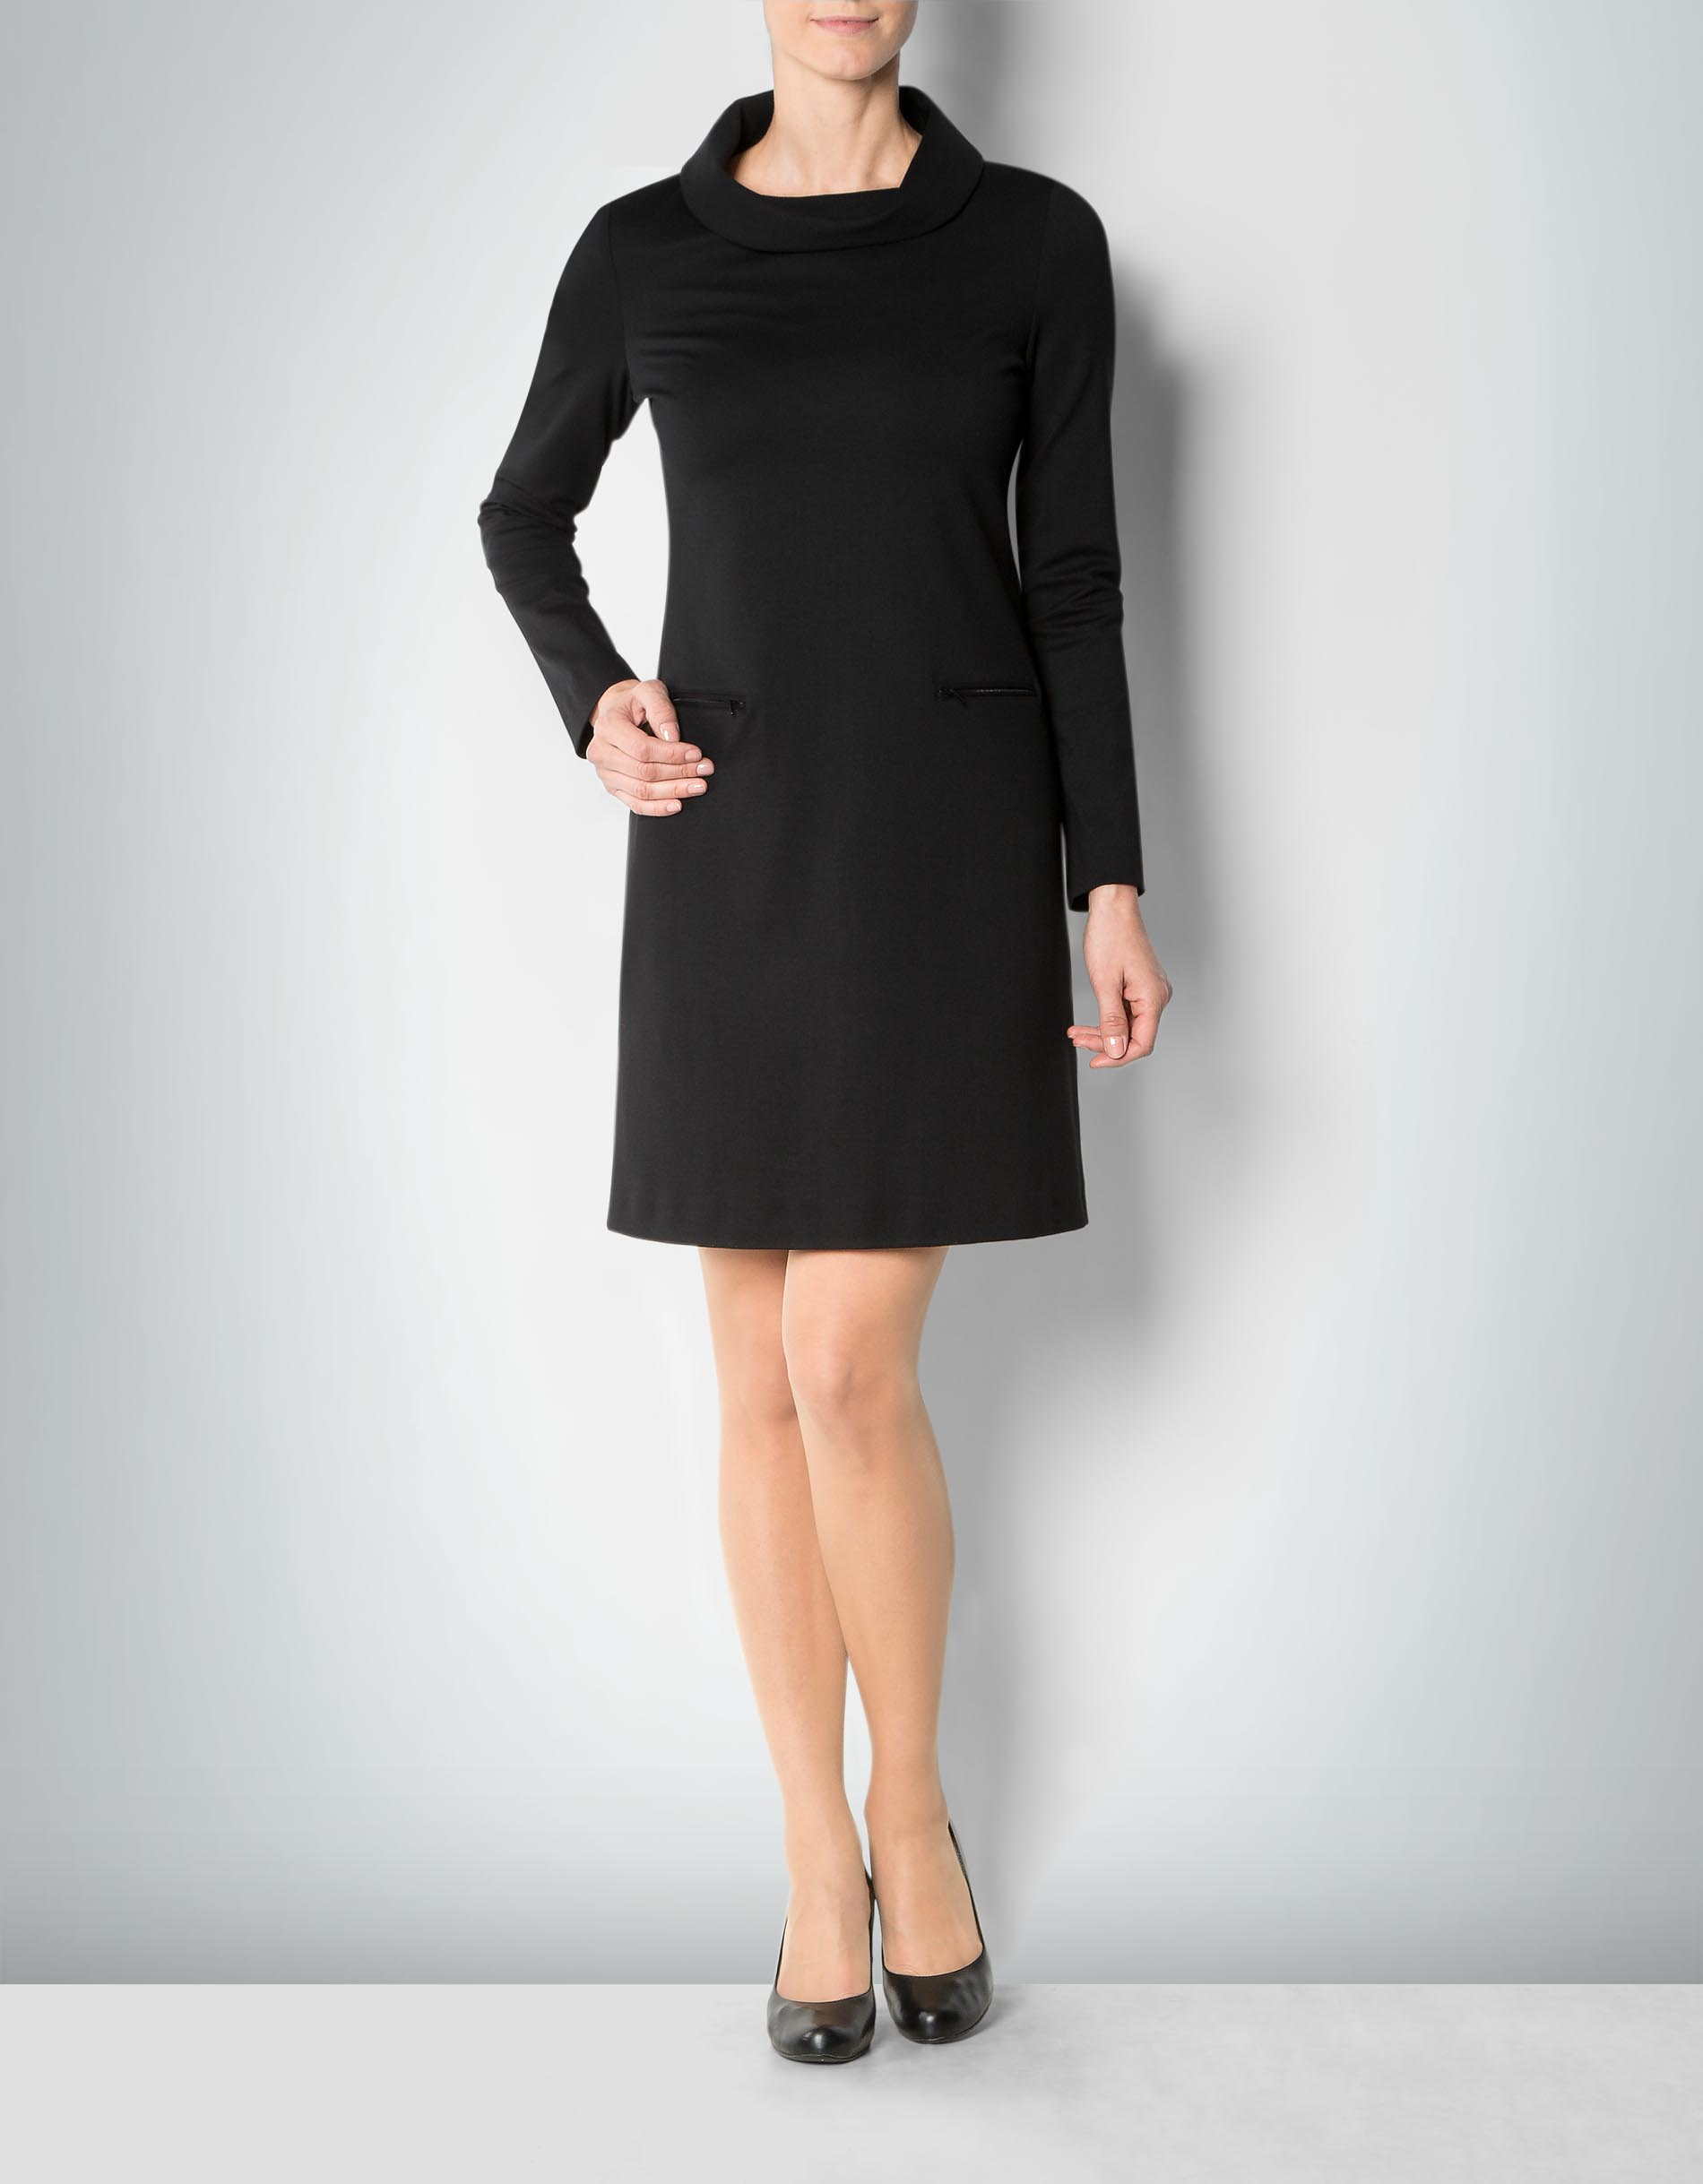 daniel hechter damen kleid schwarz mit rollkragen. Black Bedroom Furniture Sets. Home Design Ideas